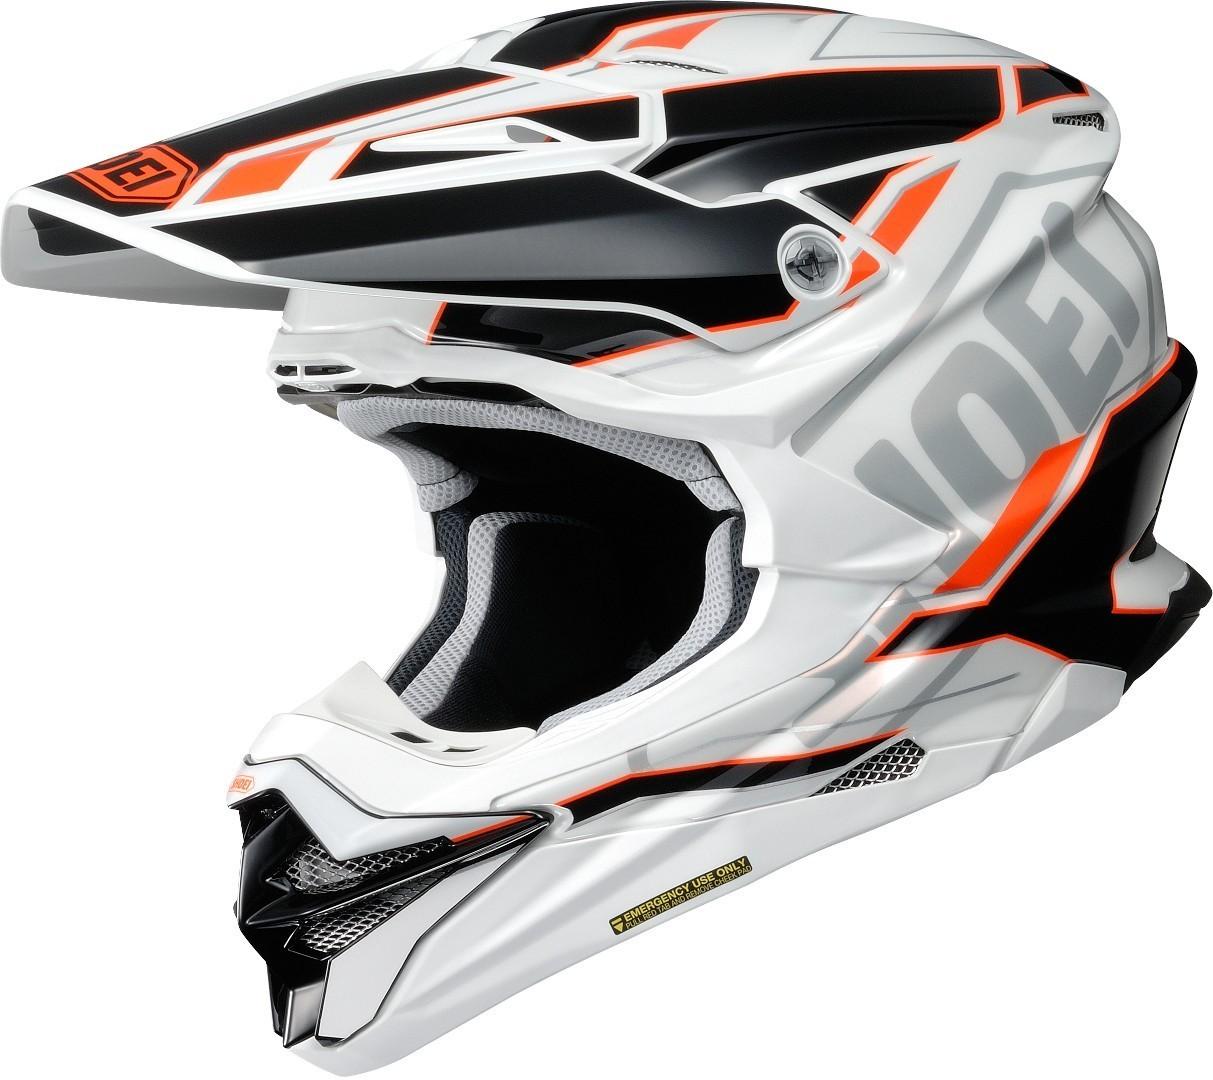 Shoei VFX-WR Allegiant Helmet - White, Orange & Black Image